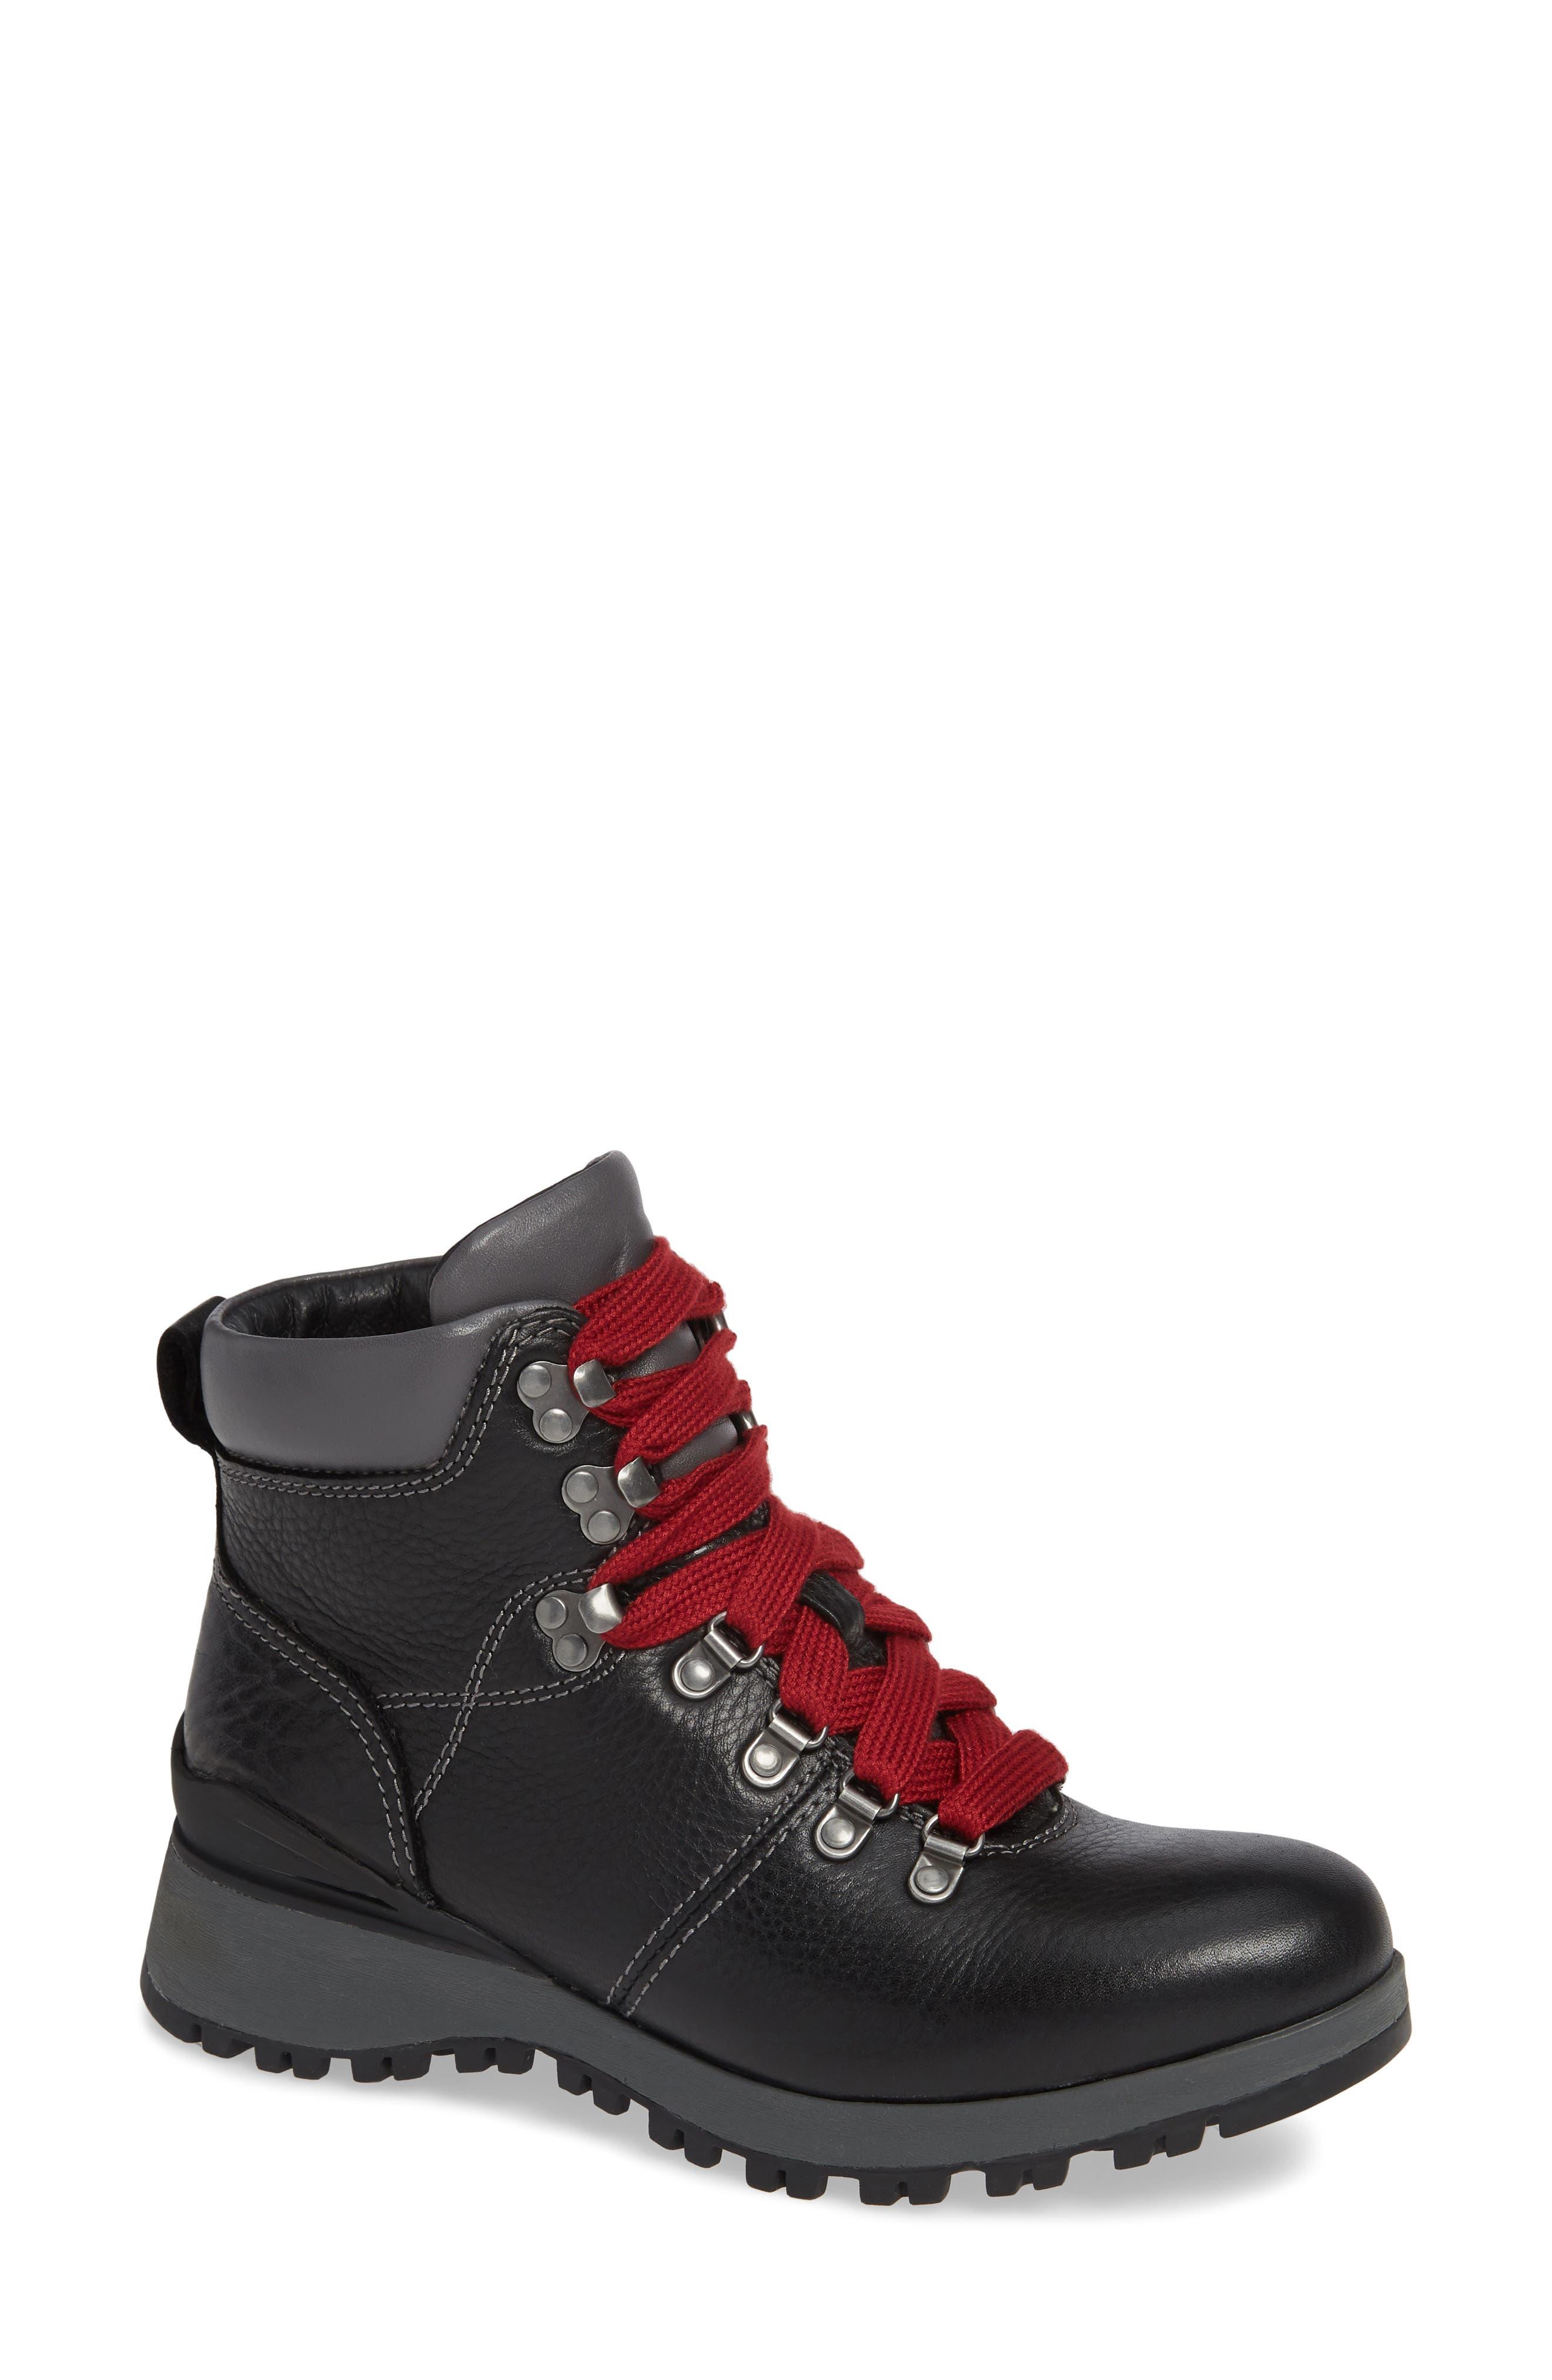 Bionica Dalton Lace-Up Waterproof Boot- Black